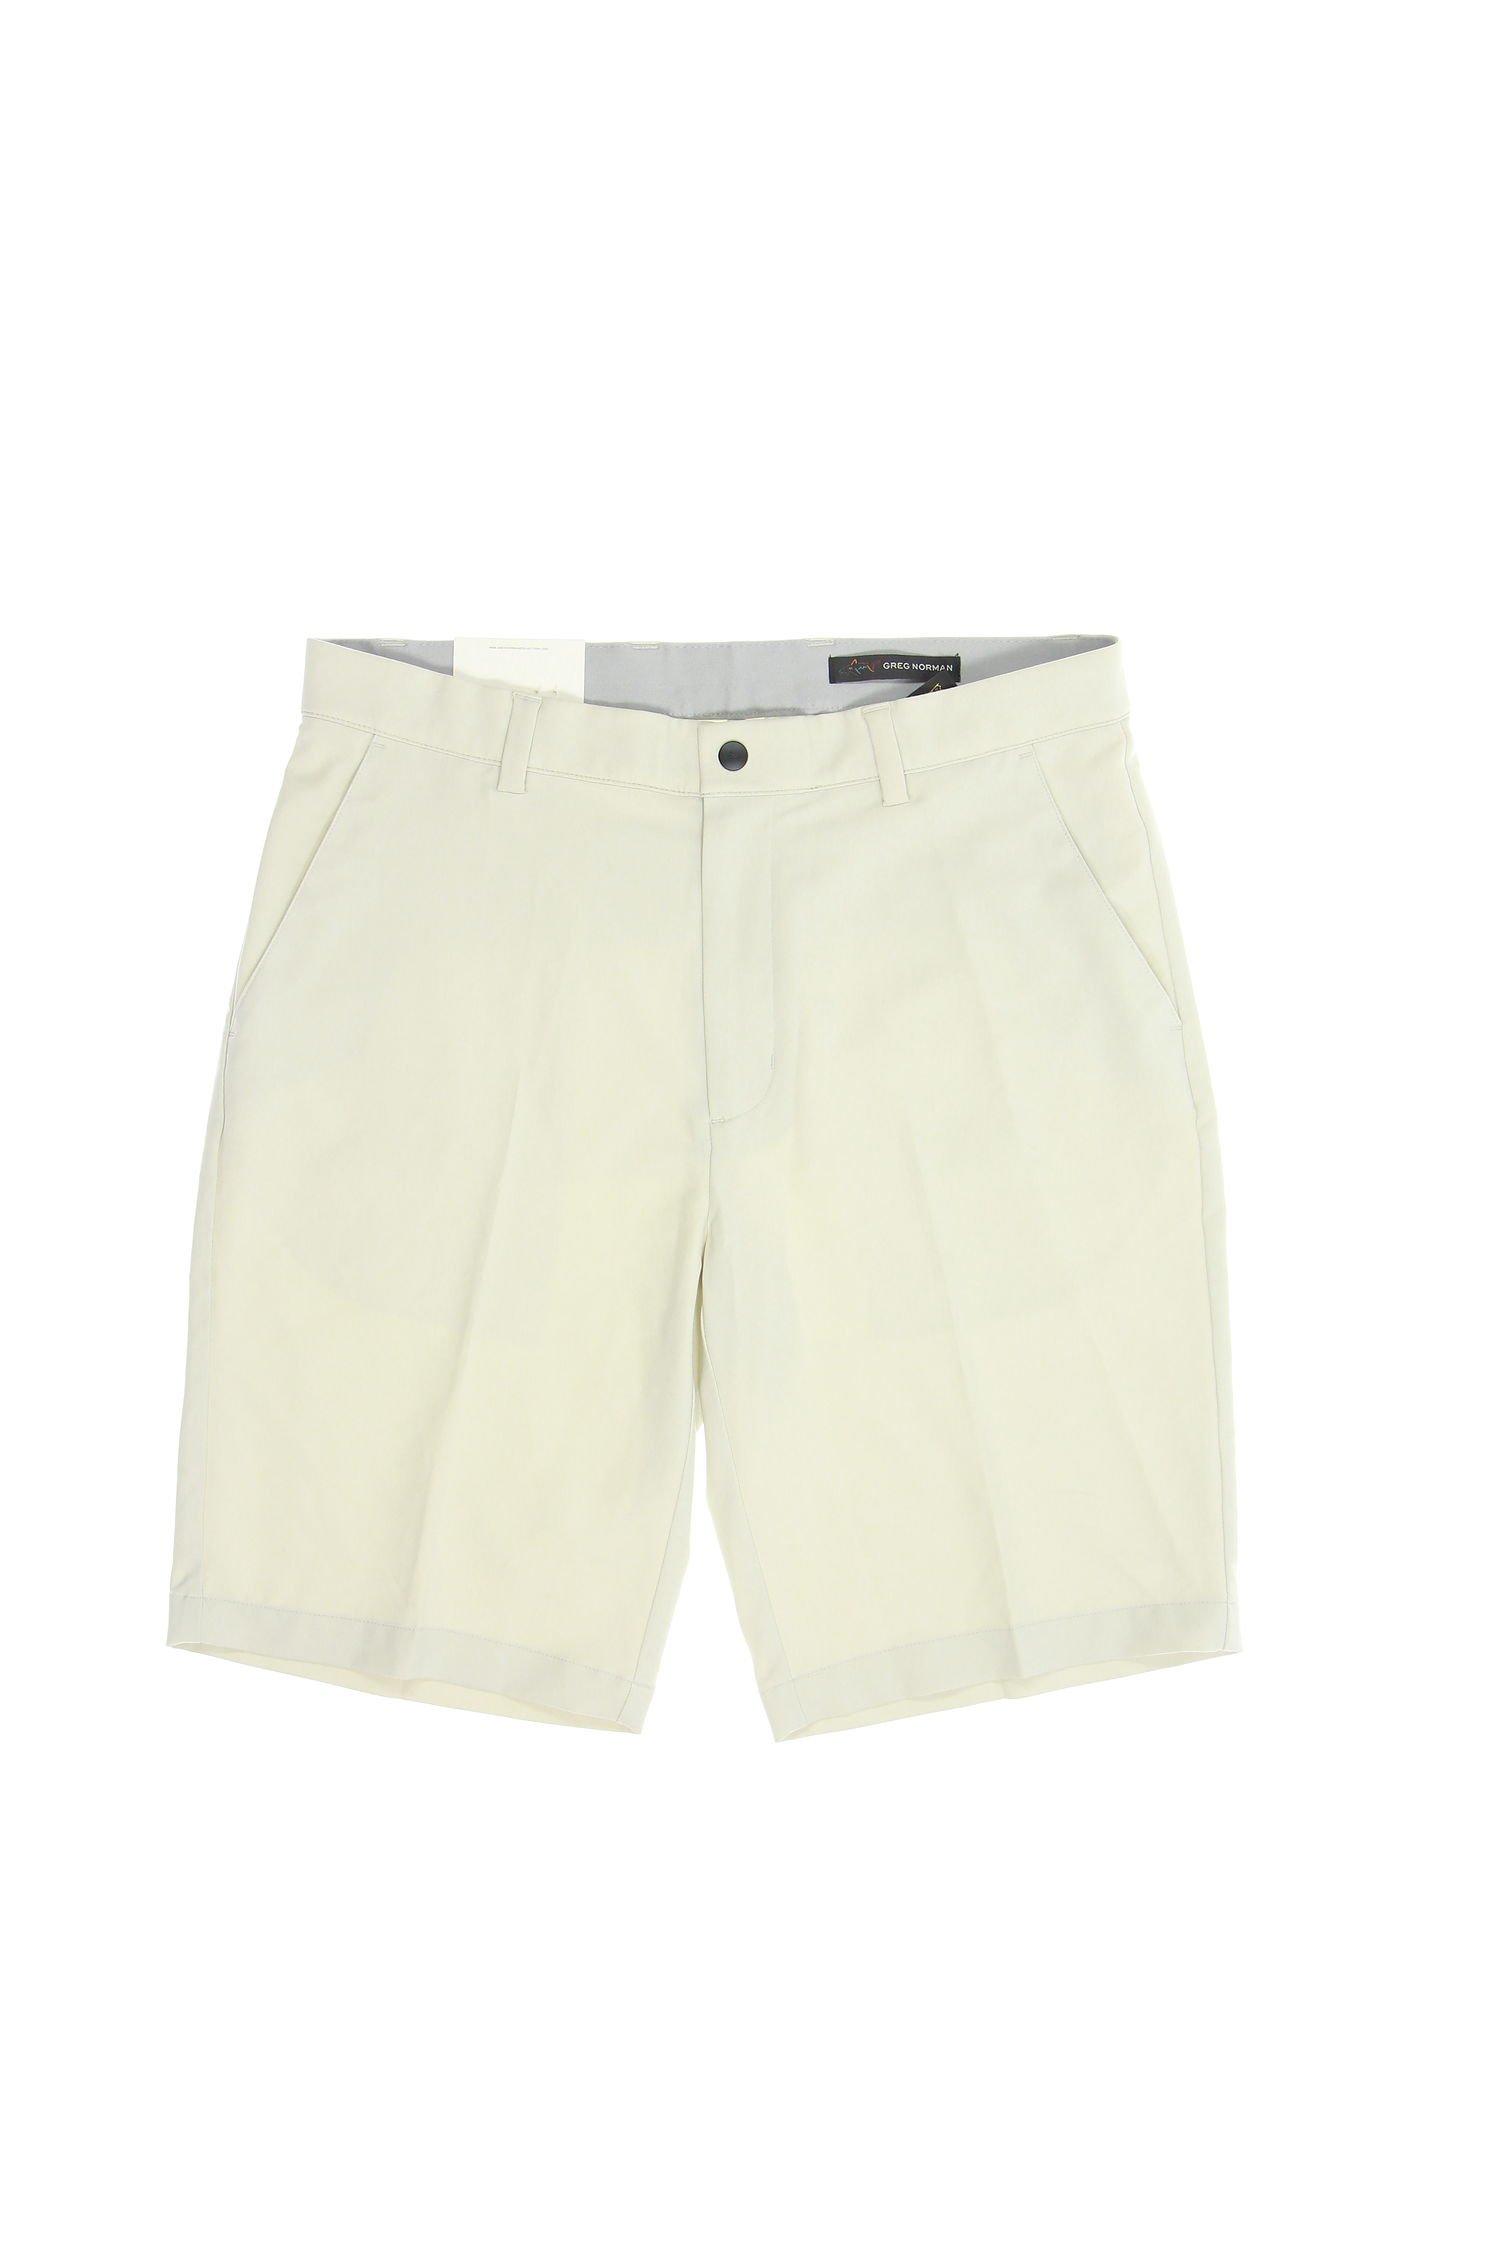 Greg Norman Tasso Elba Flat Front Walking Shorts (32, Ivory)